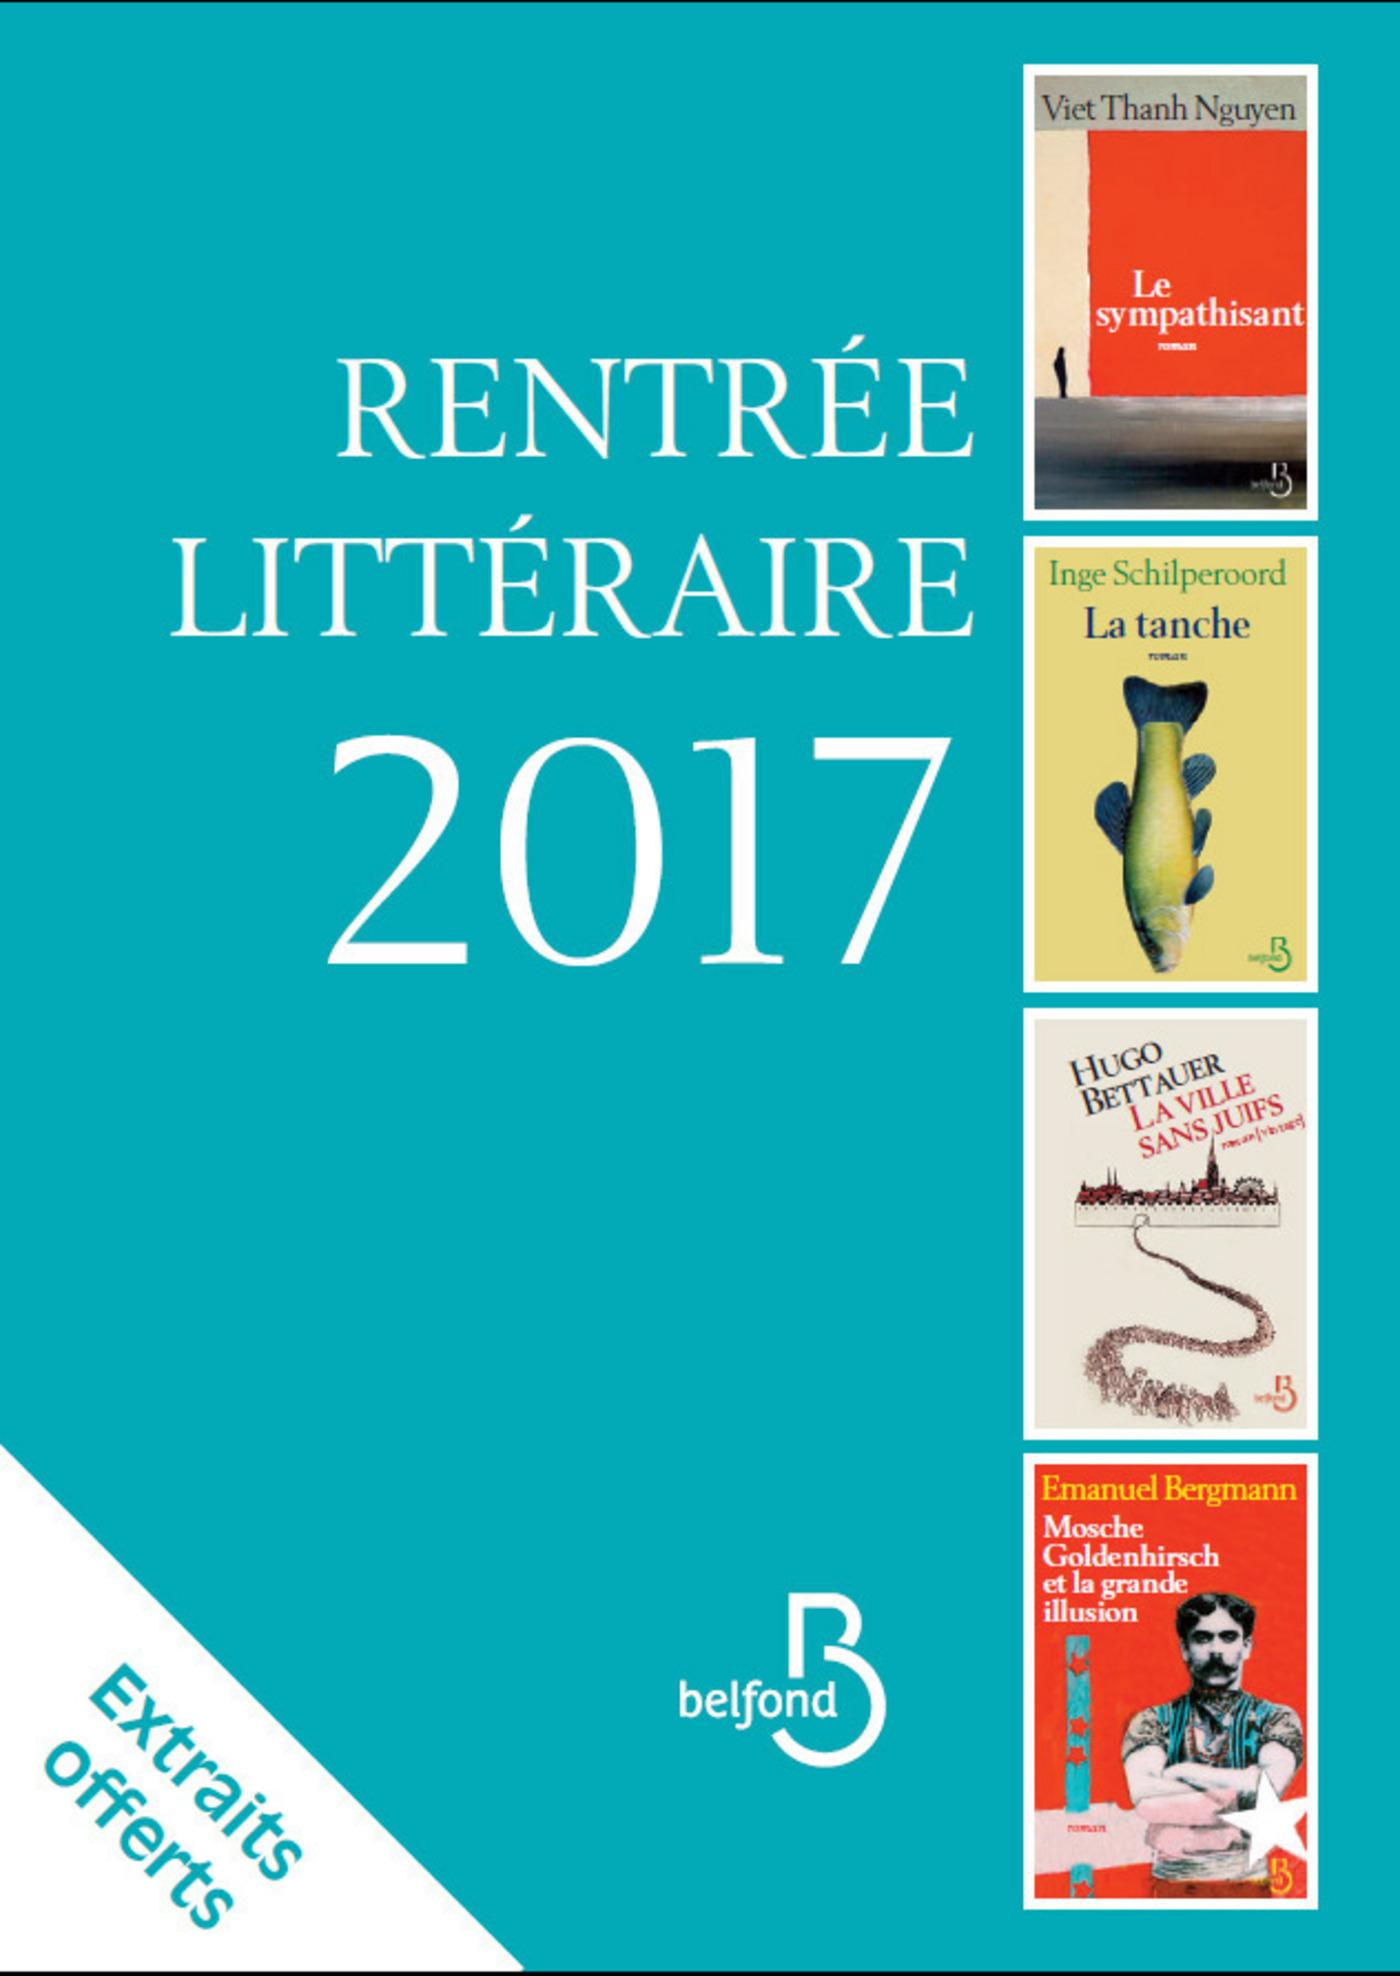 Rentrée littéraire Belfond Etranger 2017 (extraits gratuits)